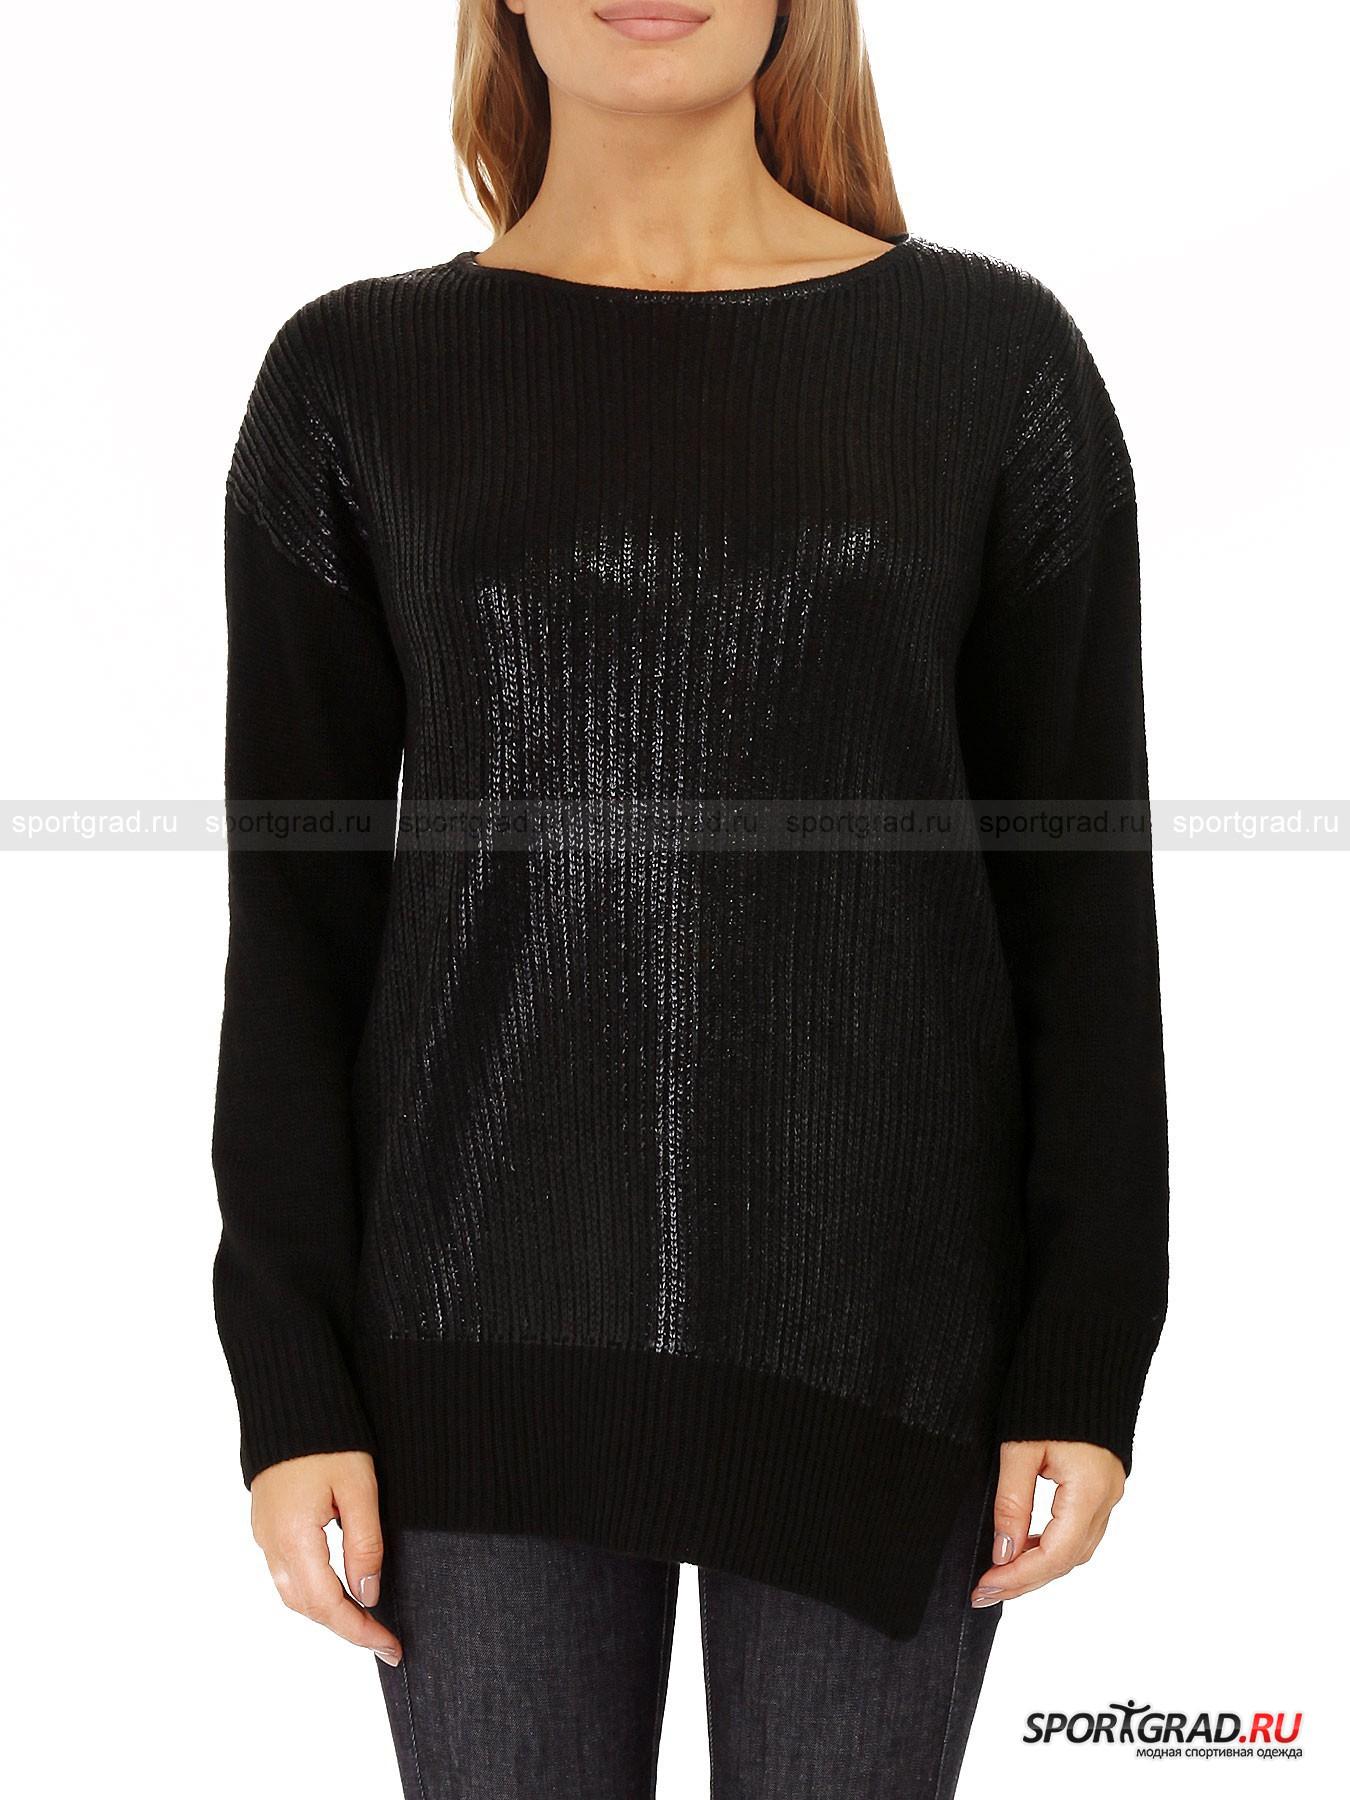 ������ ������� Sweater DEHA